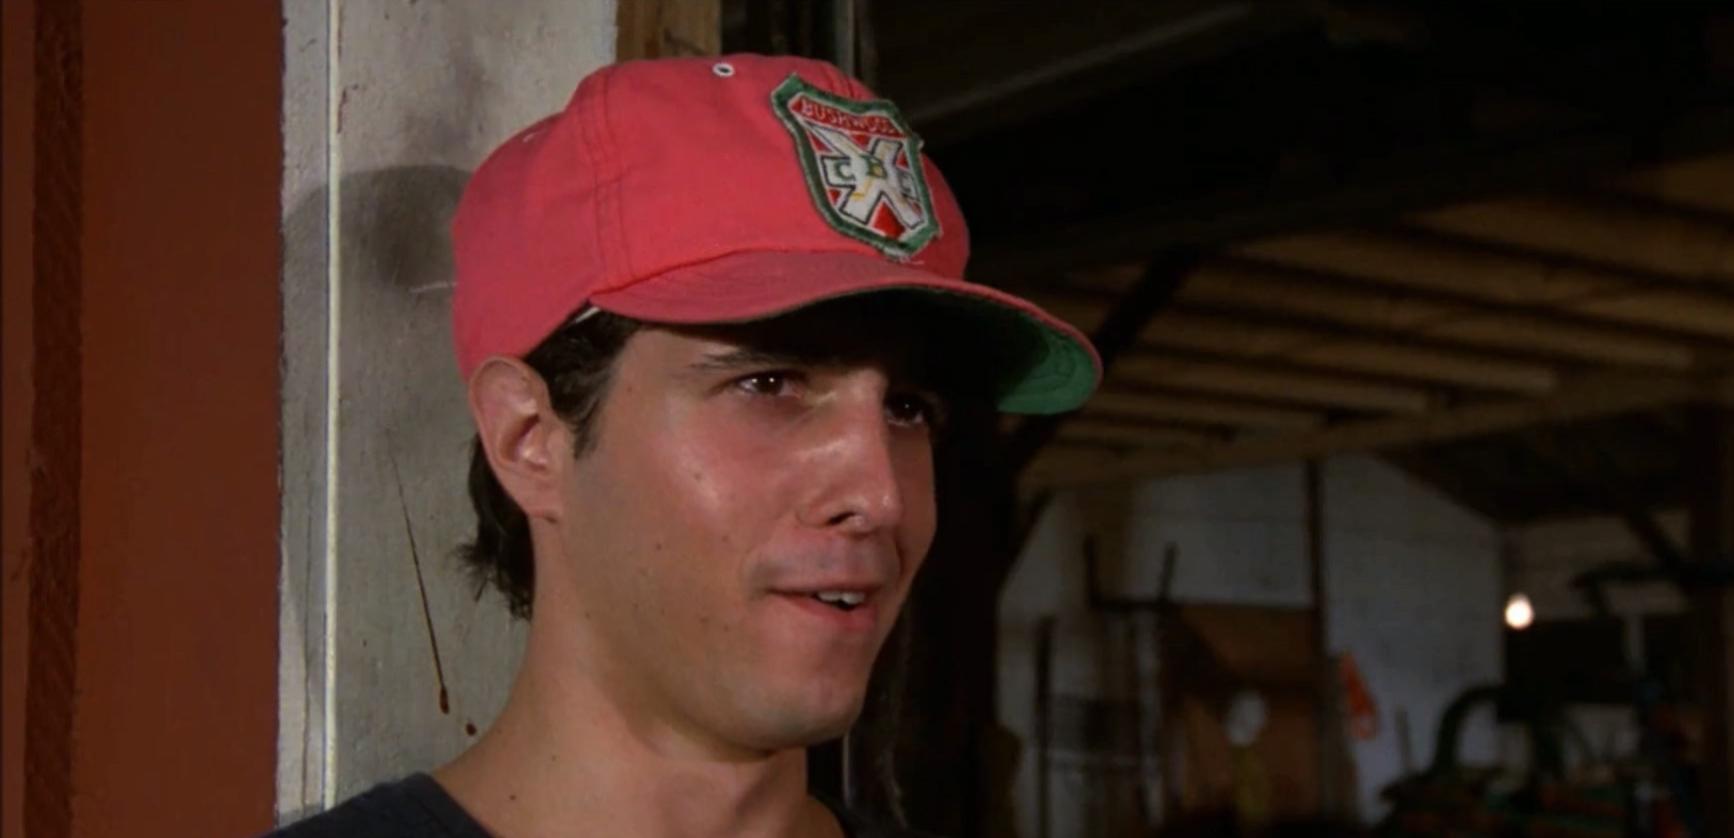 Rode baseball cap uit Caddyshack (1980)